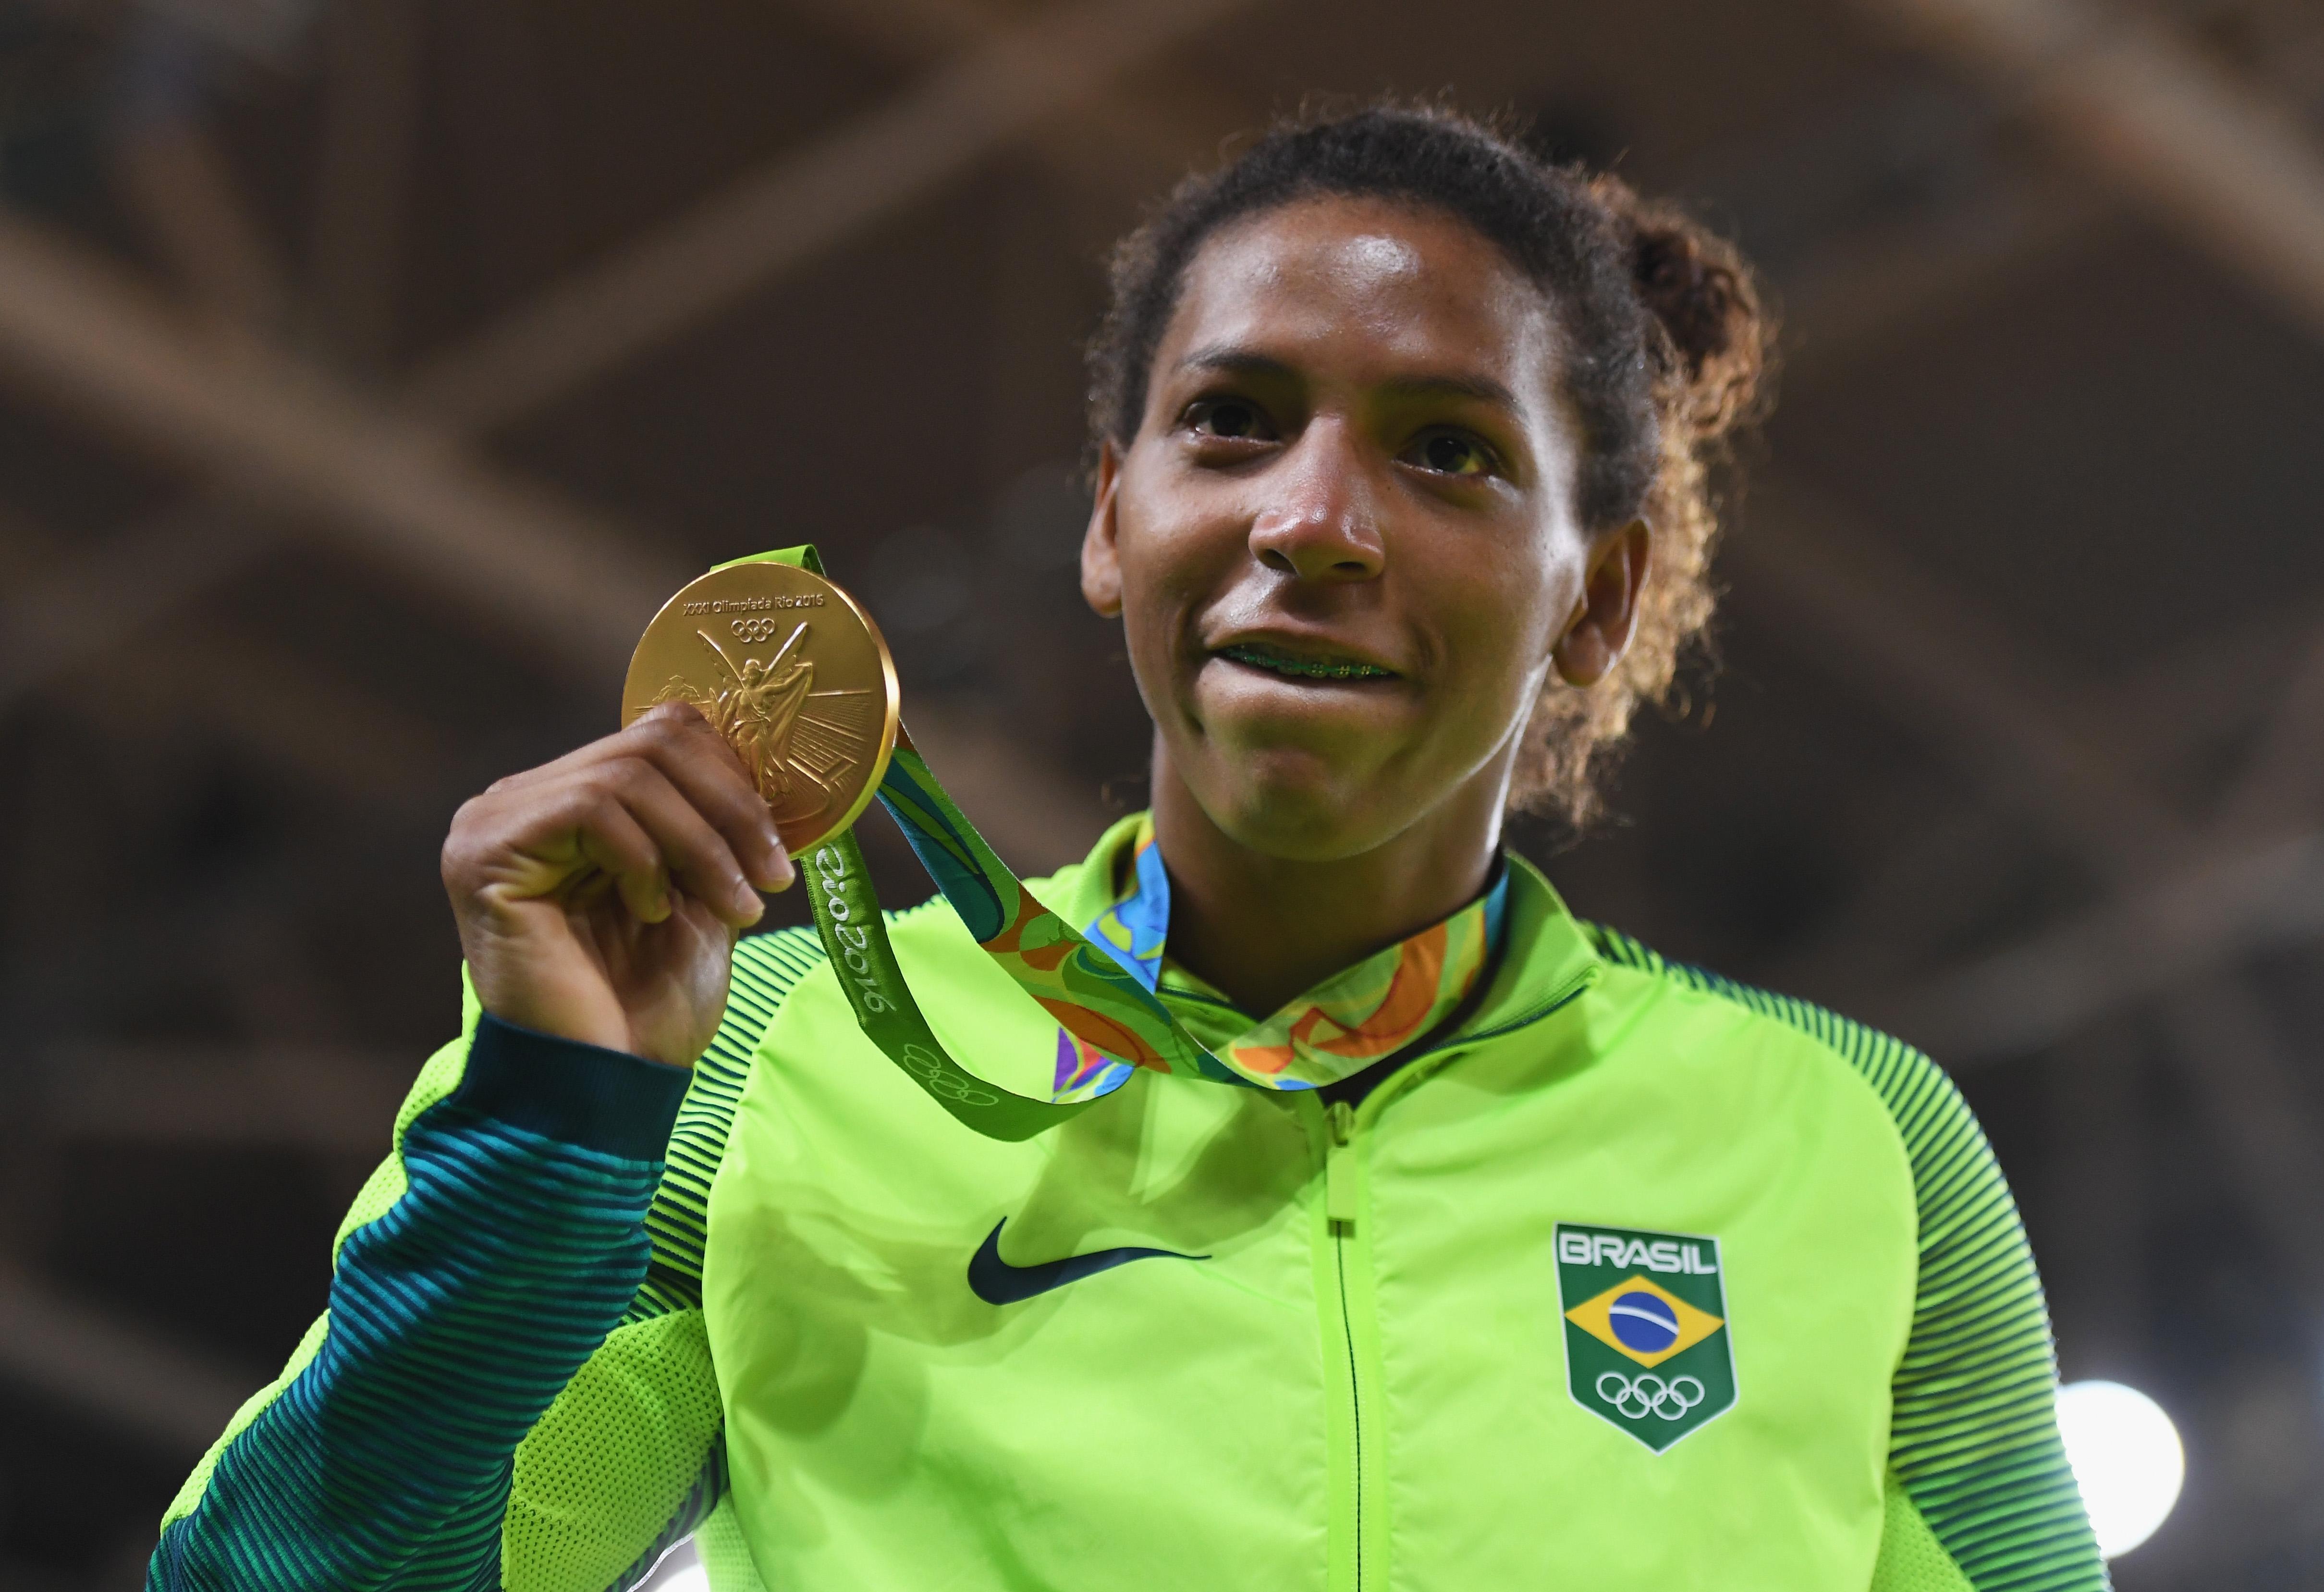 Rafaela Silva celebrates with her gold medal.